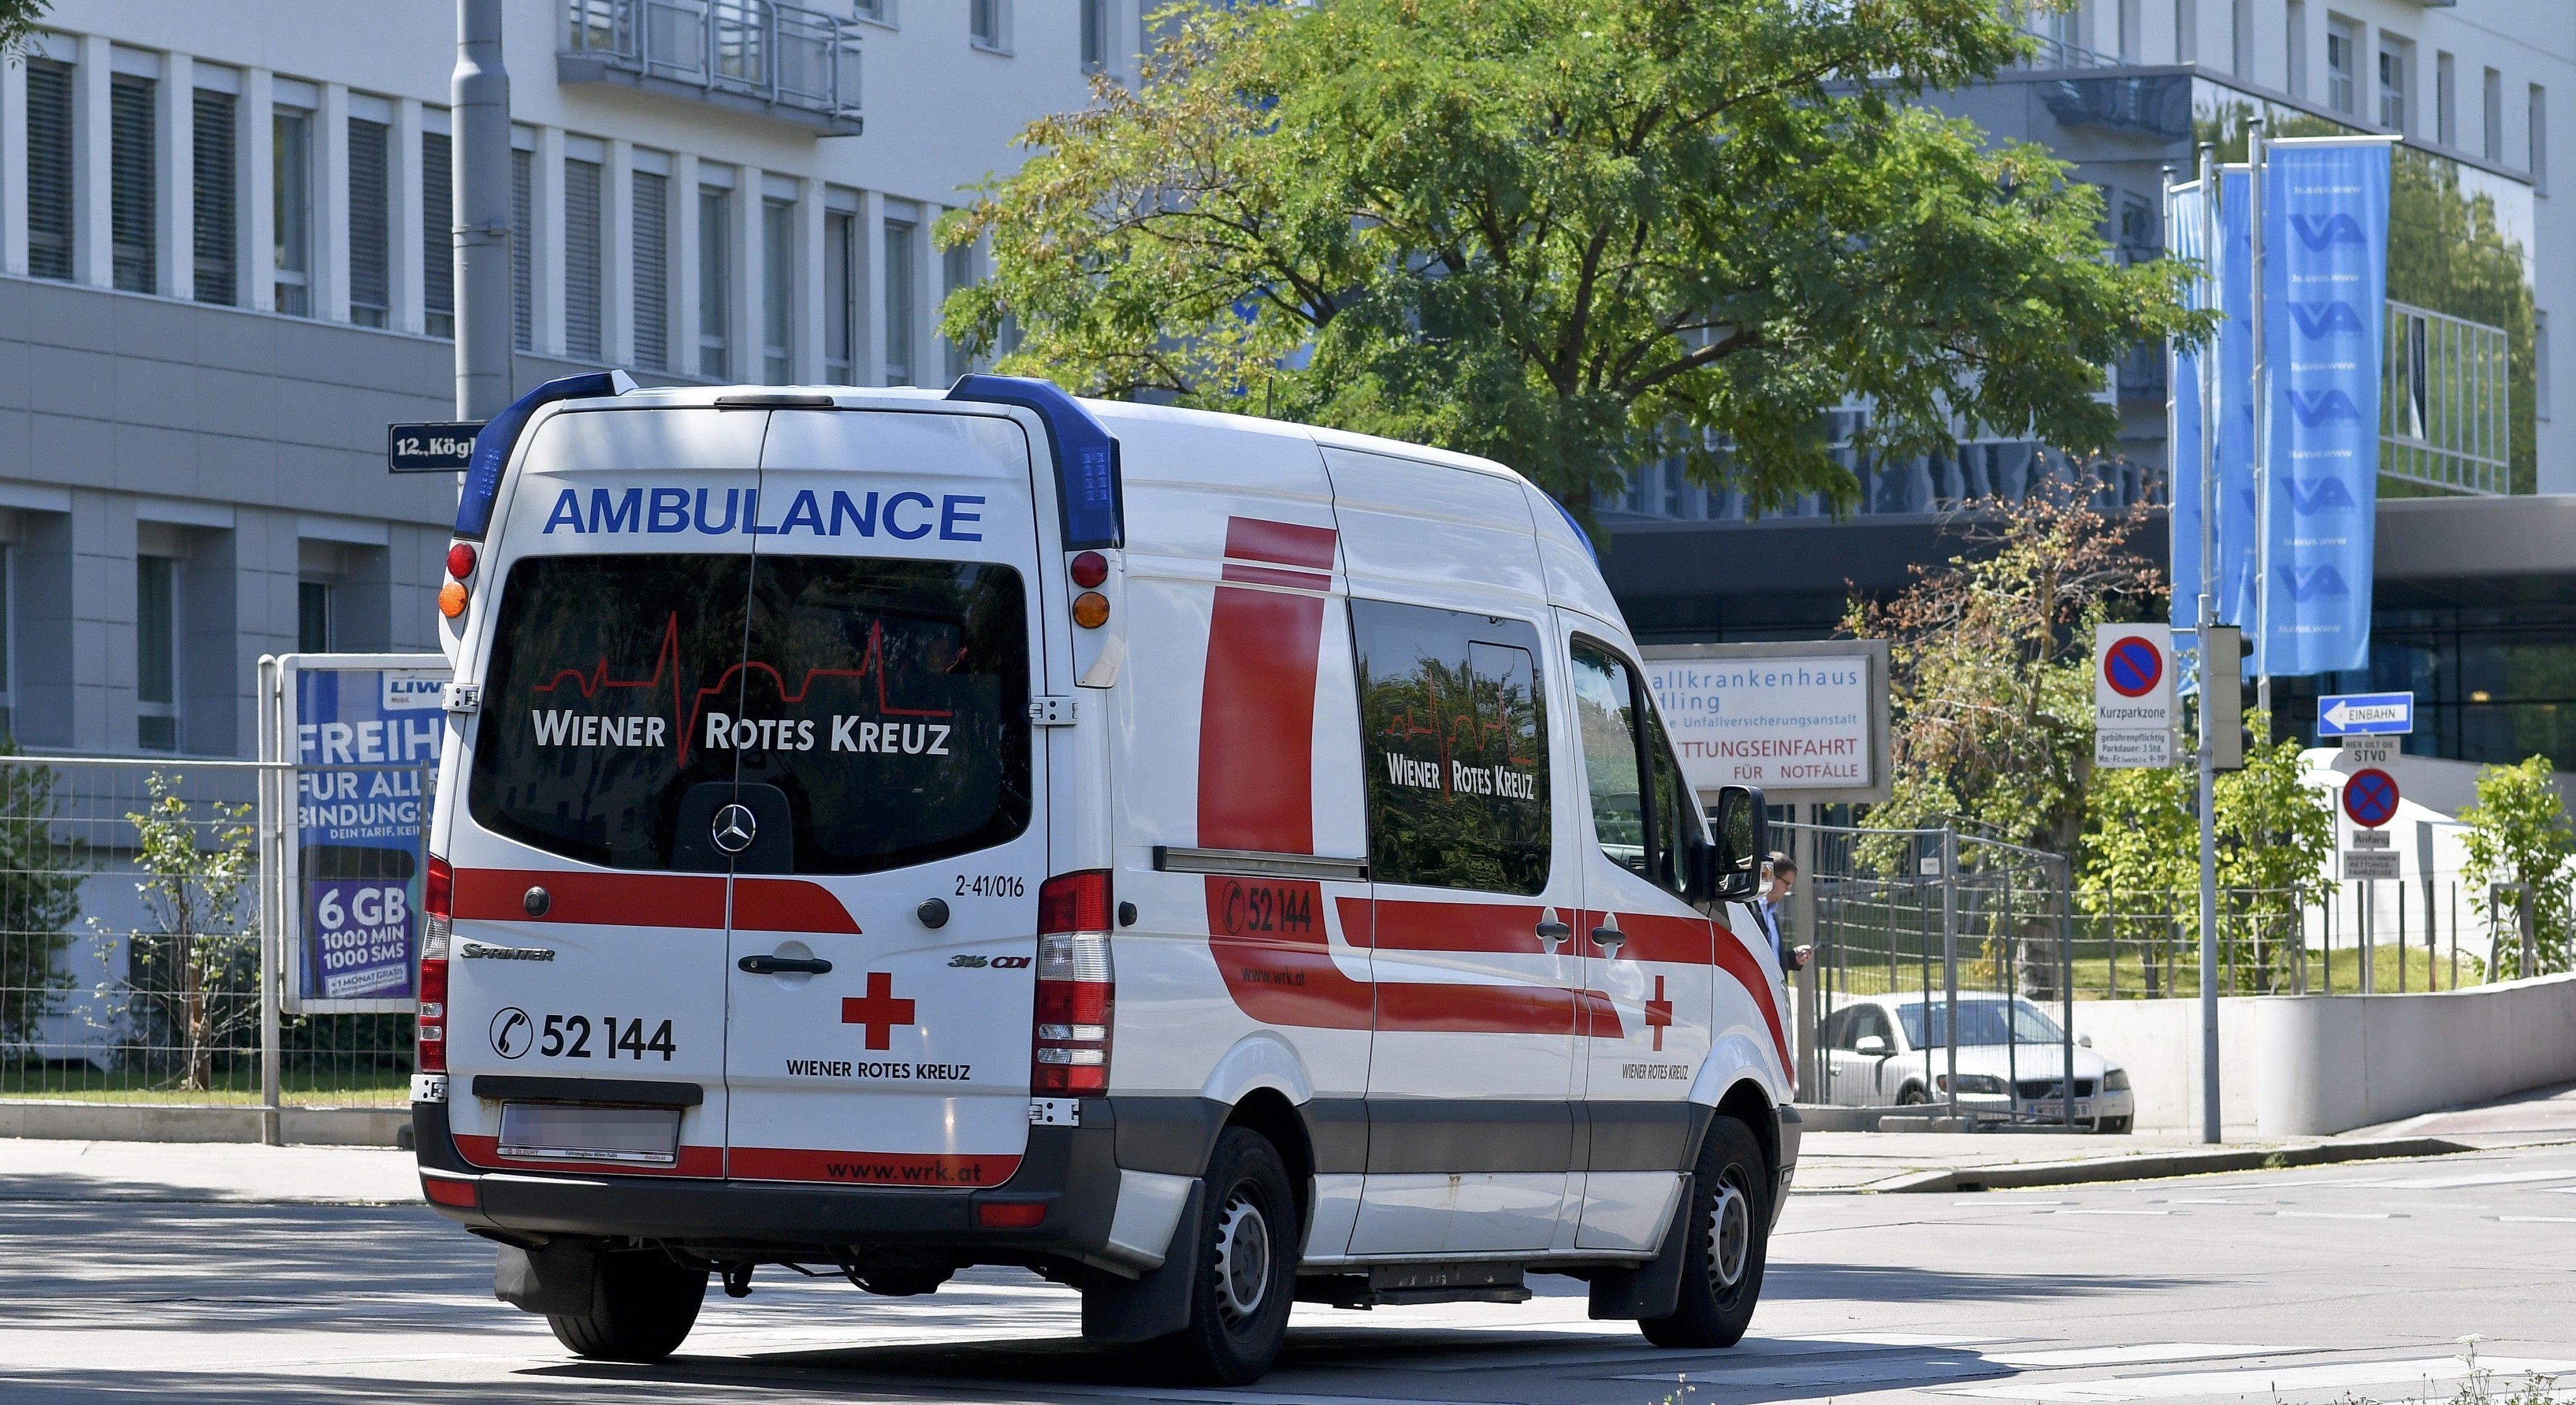 Gruppe greift Ehepaar in Wien-Favoriten an: Mann (67) schwebt in Lebensgefahr